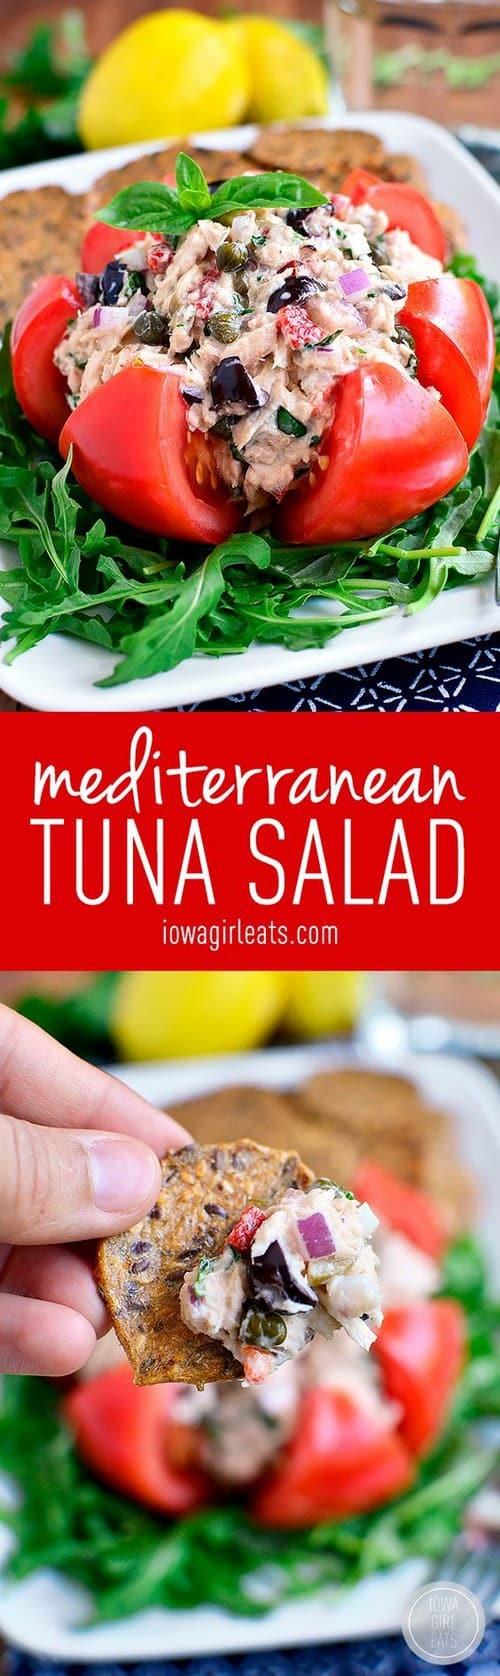 mediterranean-tuna-salad